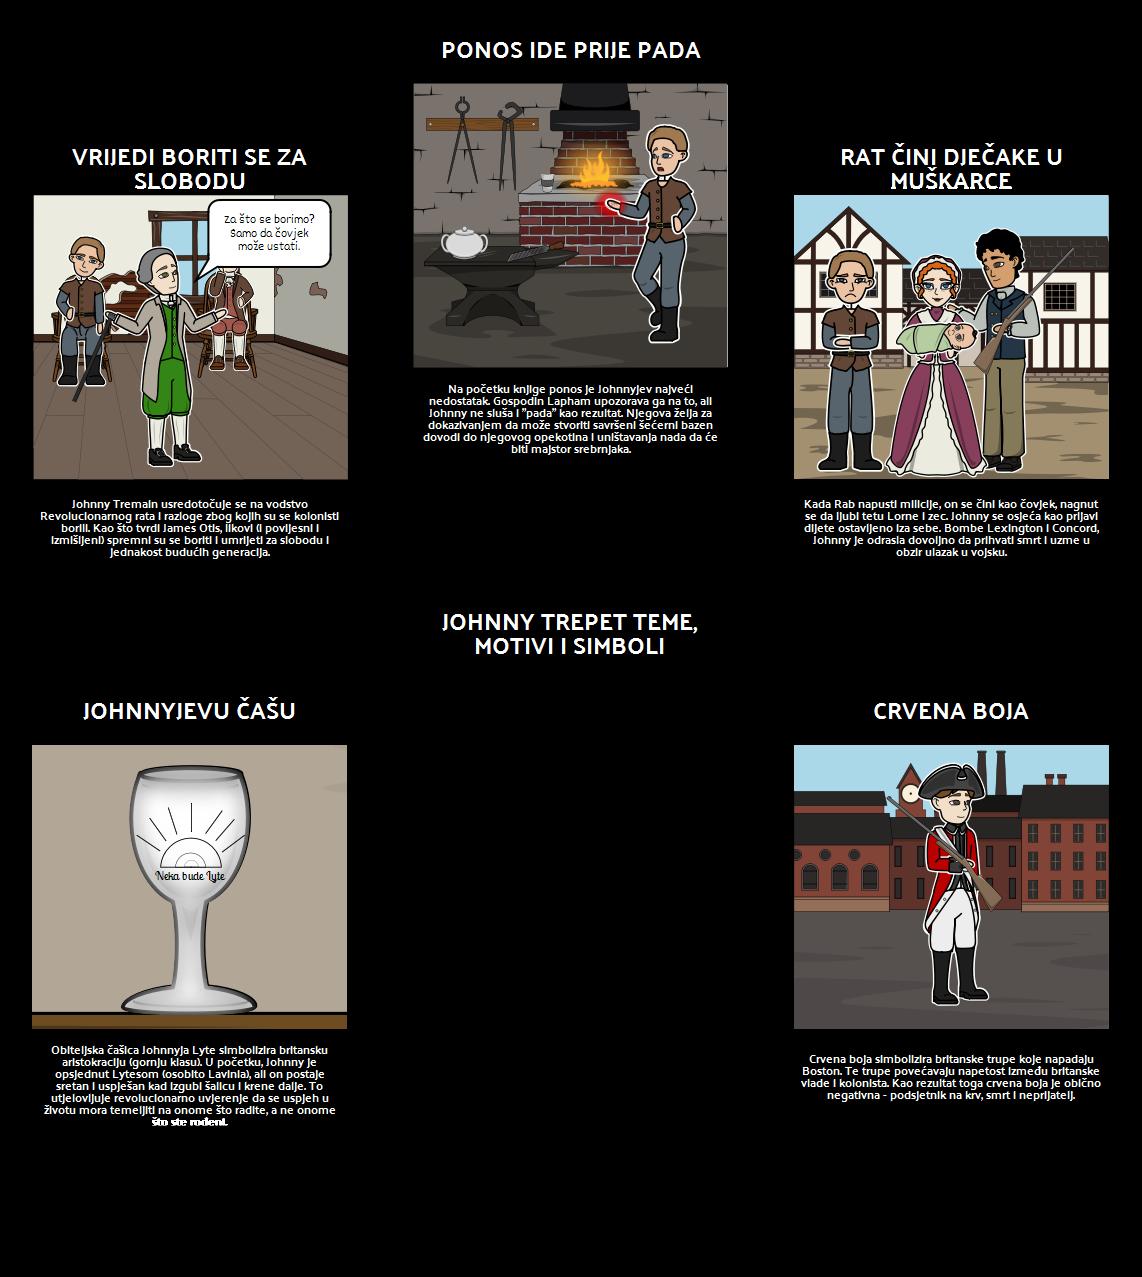 Johnny Tremain Teme, Motivi i Simboli